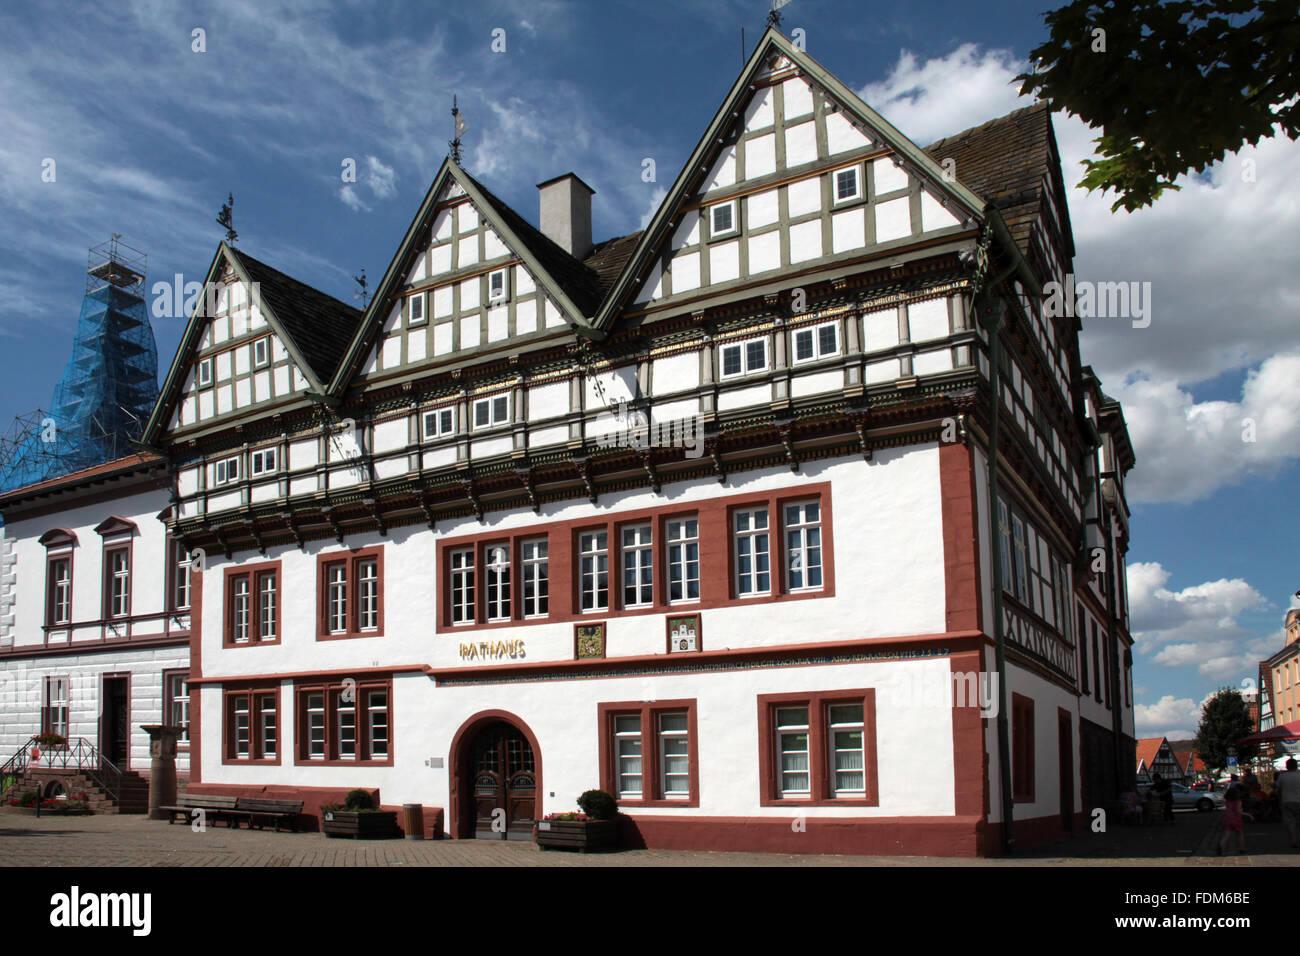 town hall,blomberg - Stock Image